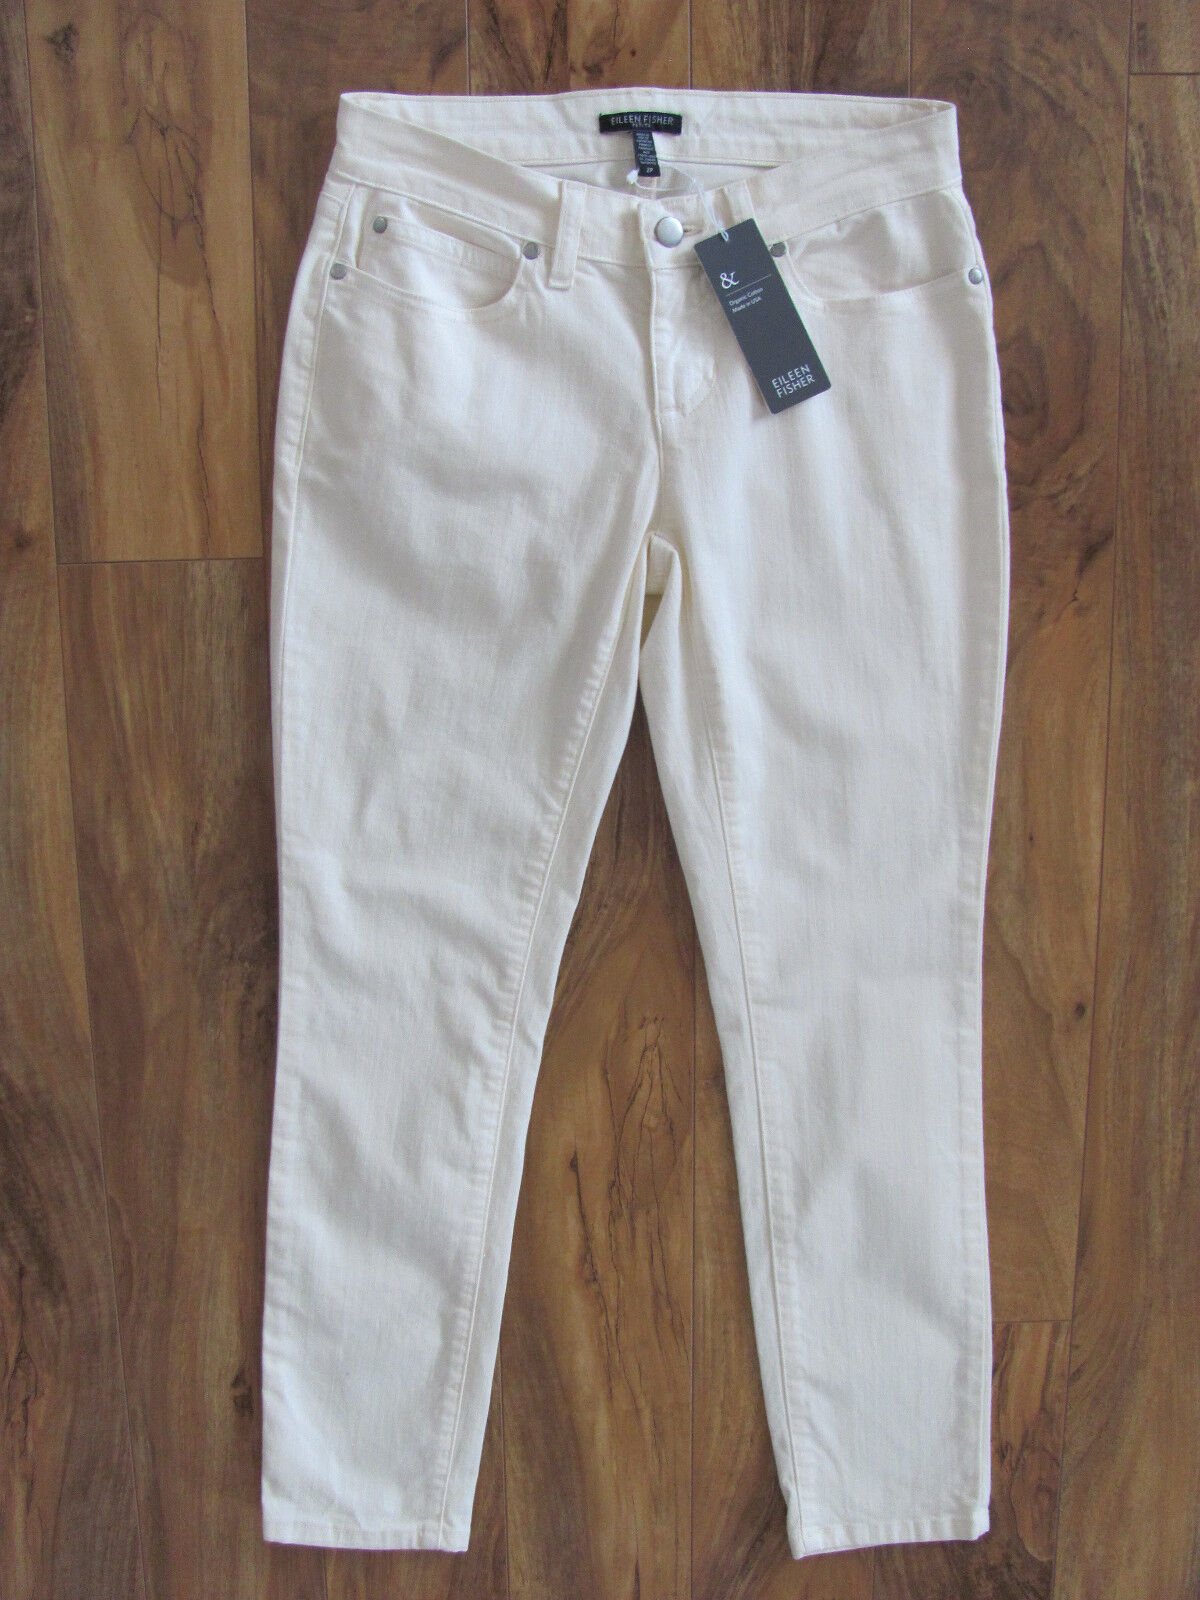 Eileen Fisher Slim Ankle Jeans-Stretch Denim -Org Cotton-Ecru -Size 2P -NWT  178